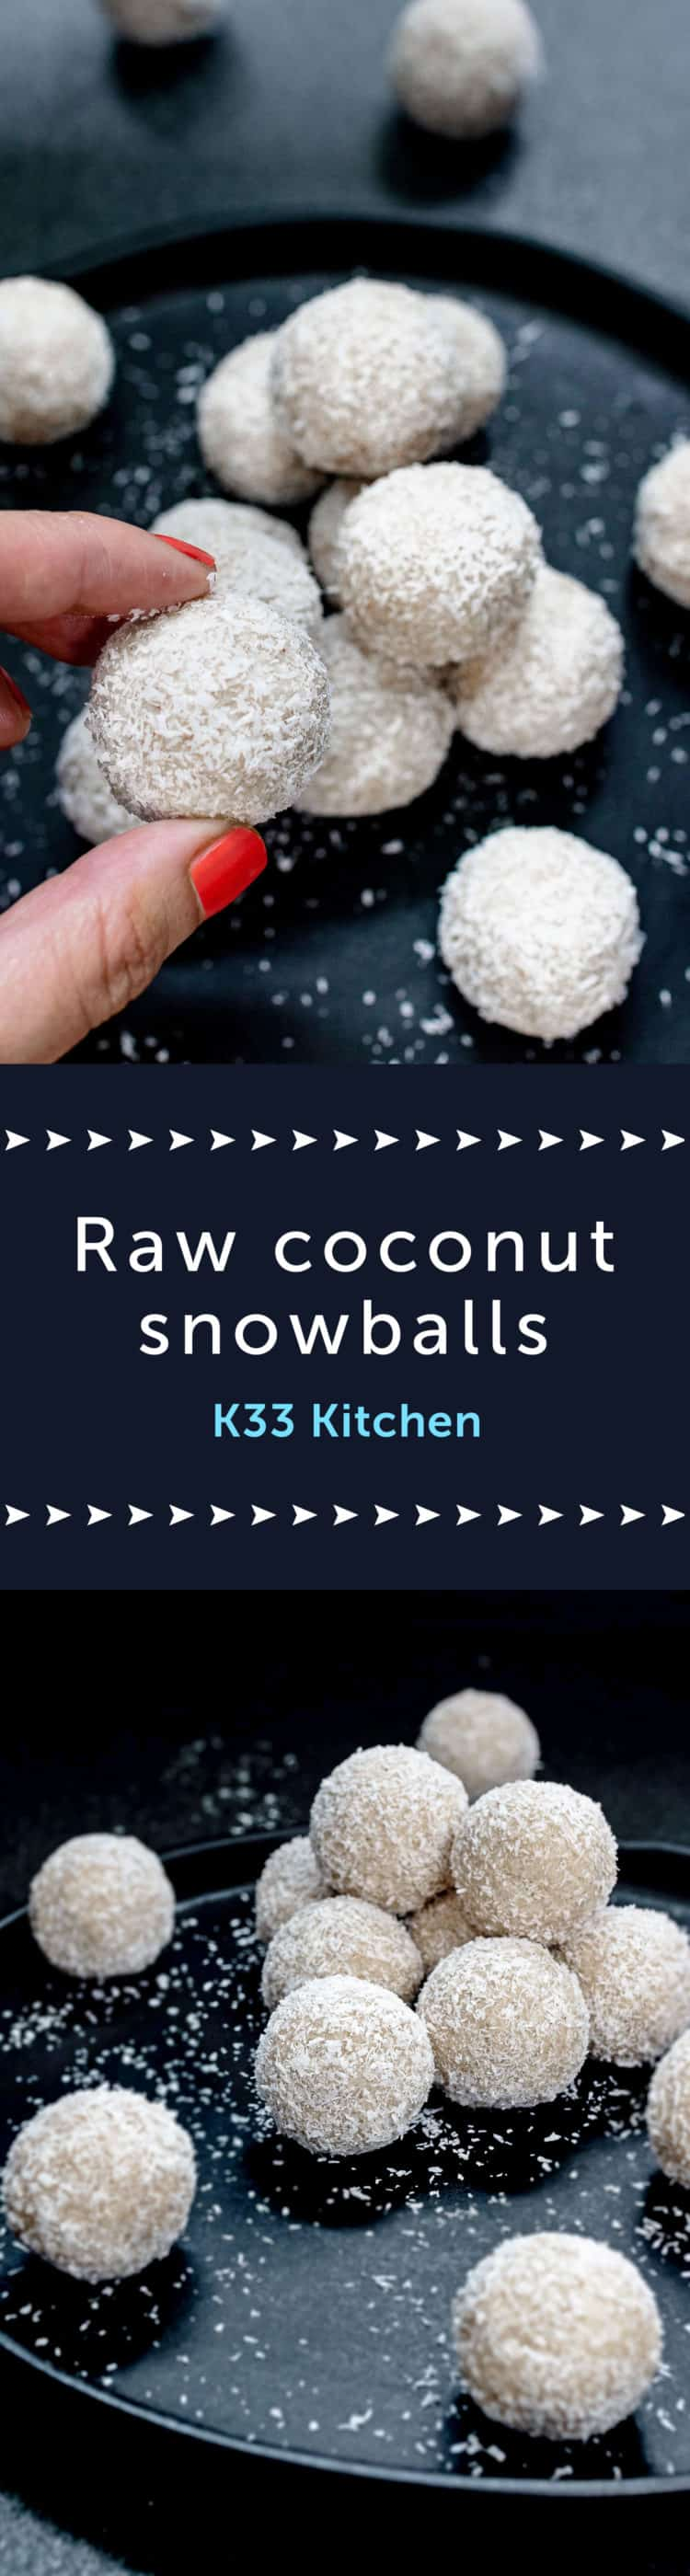 Raw coconut snowballs